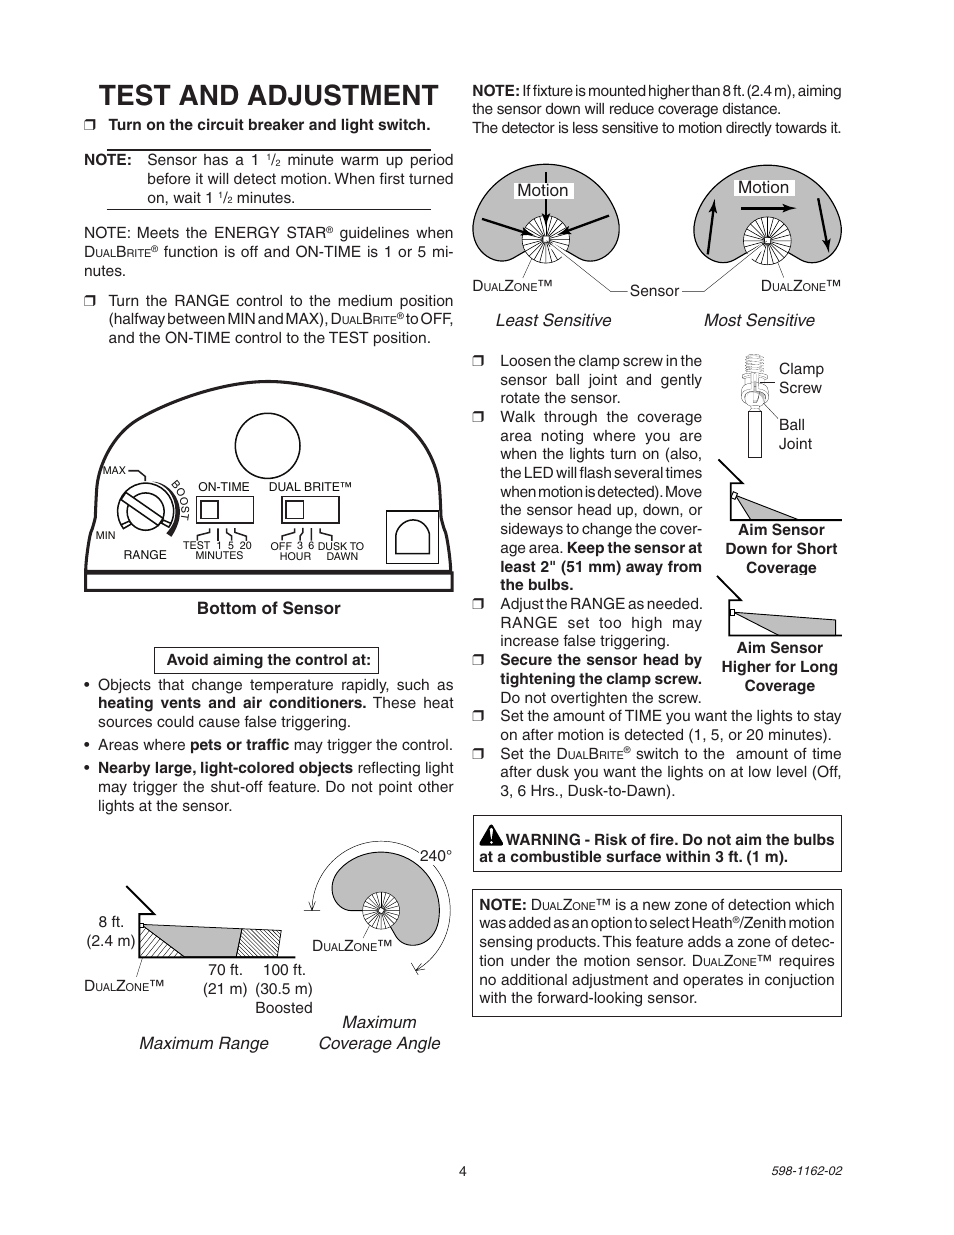 Test And Adjustment Heath Zenith Dualbrite Motion Sensor